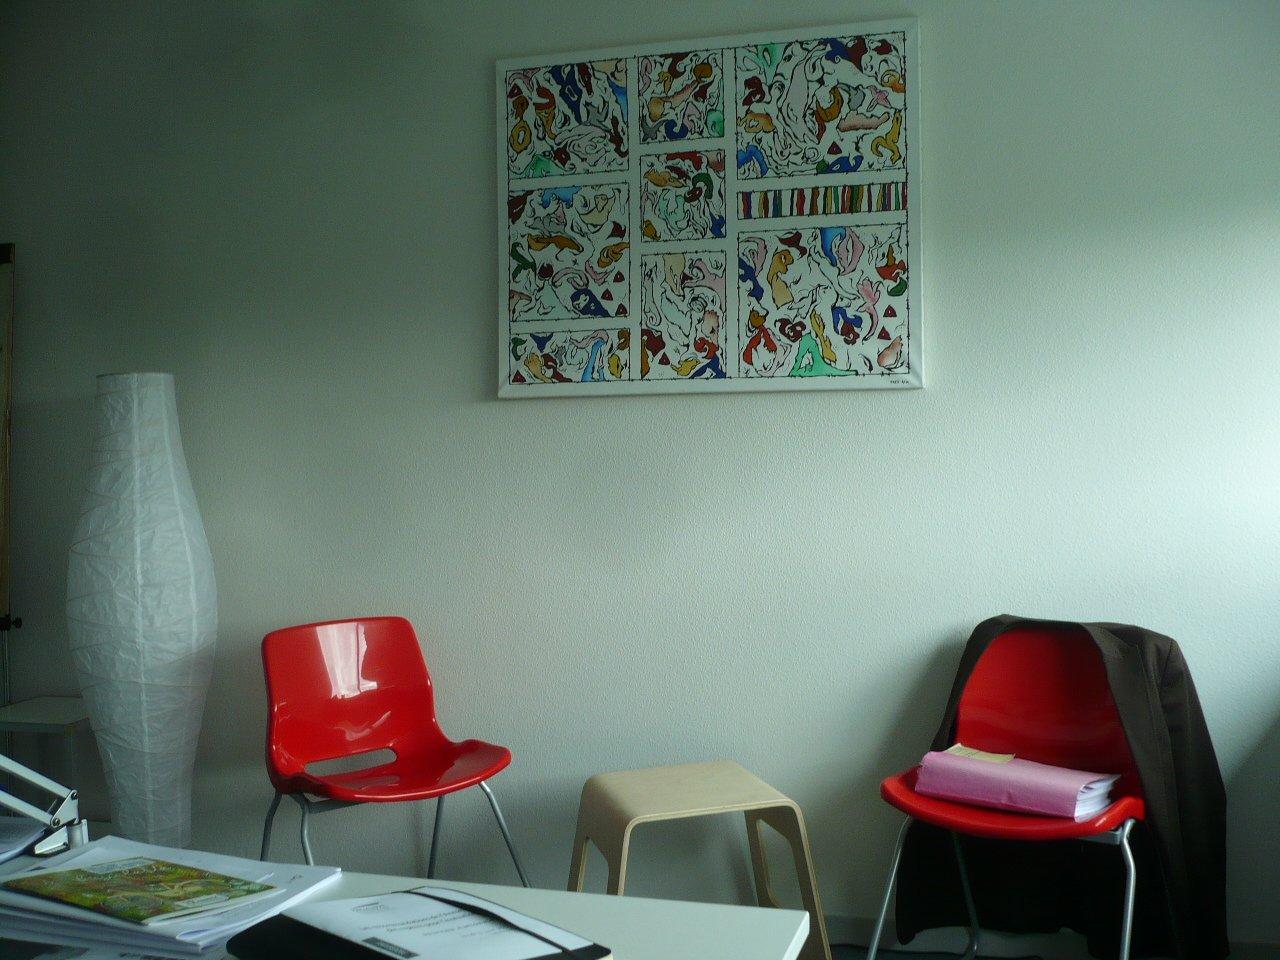 officecm.jpg